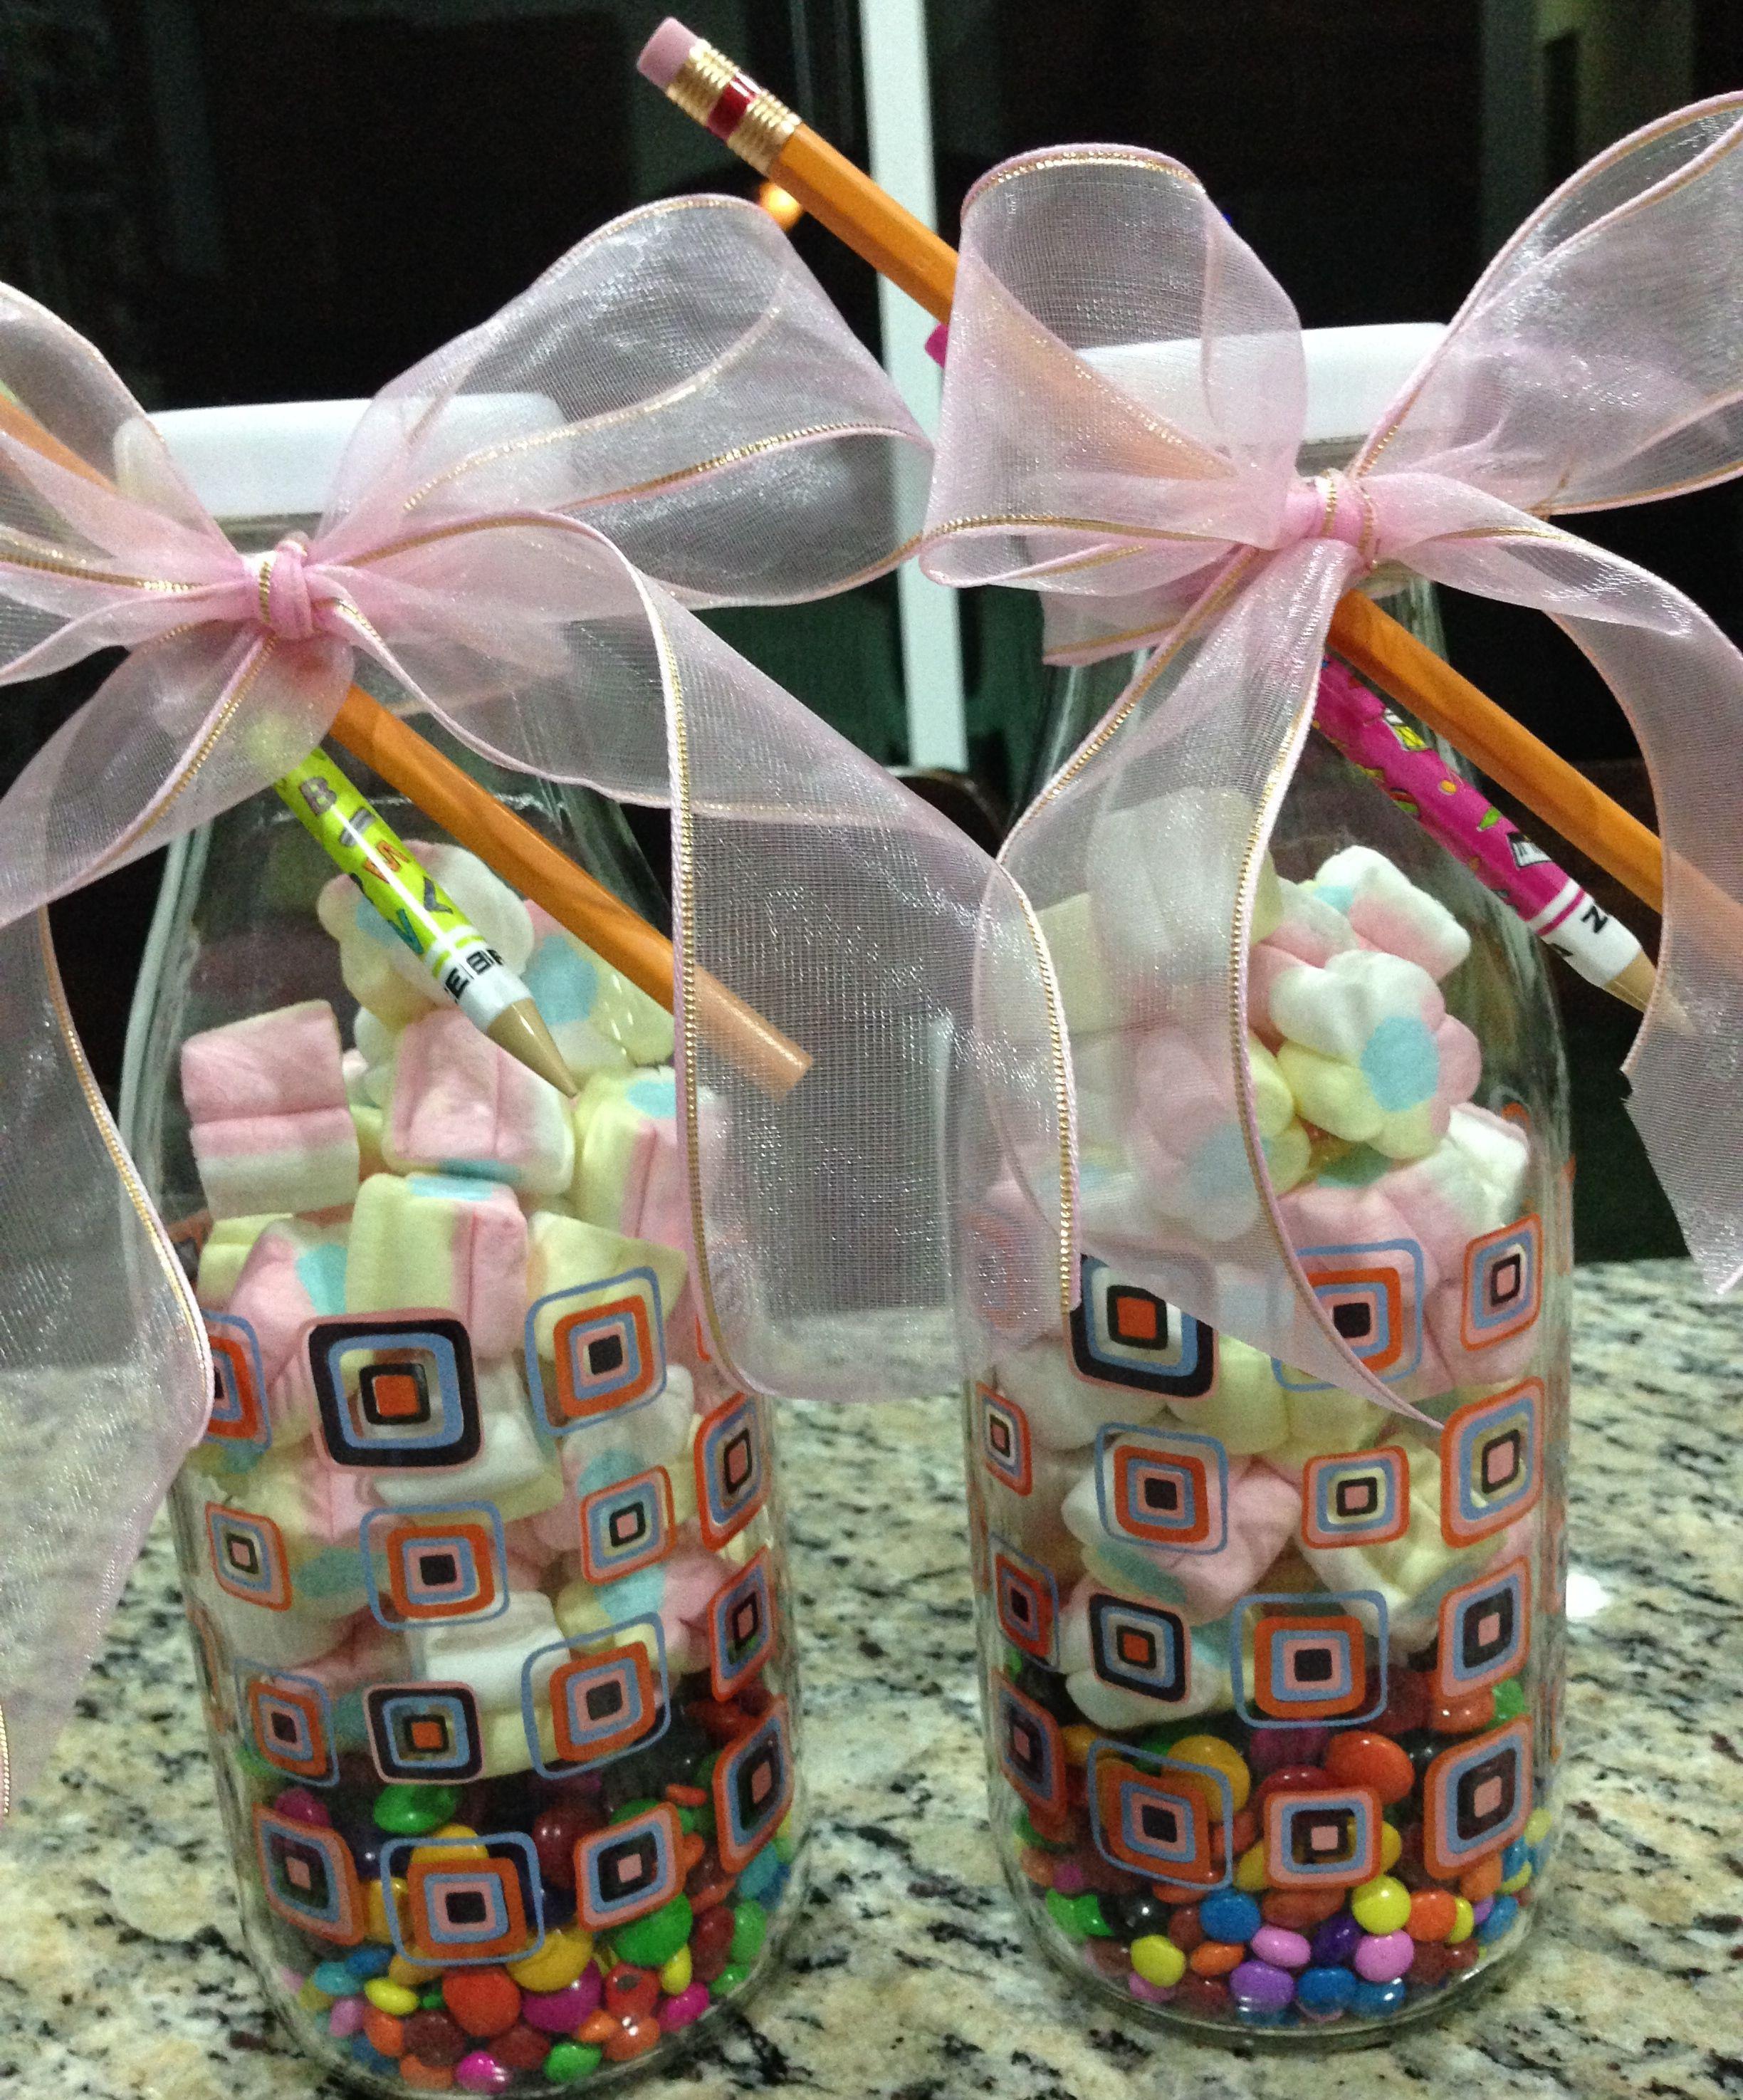 Frascos decorados diy manualidades pinterest - Diy frascos decorados ...